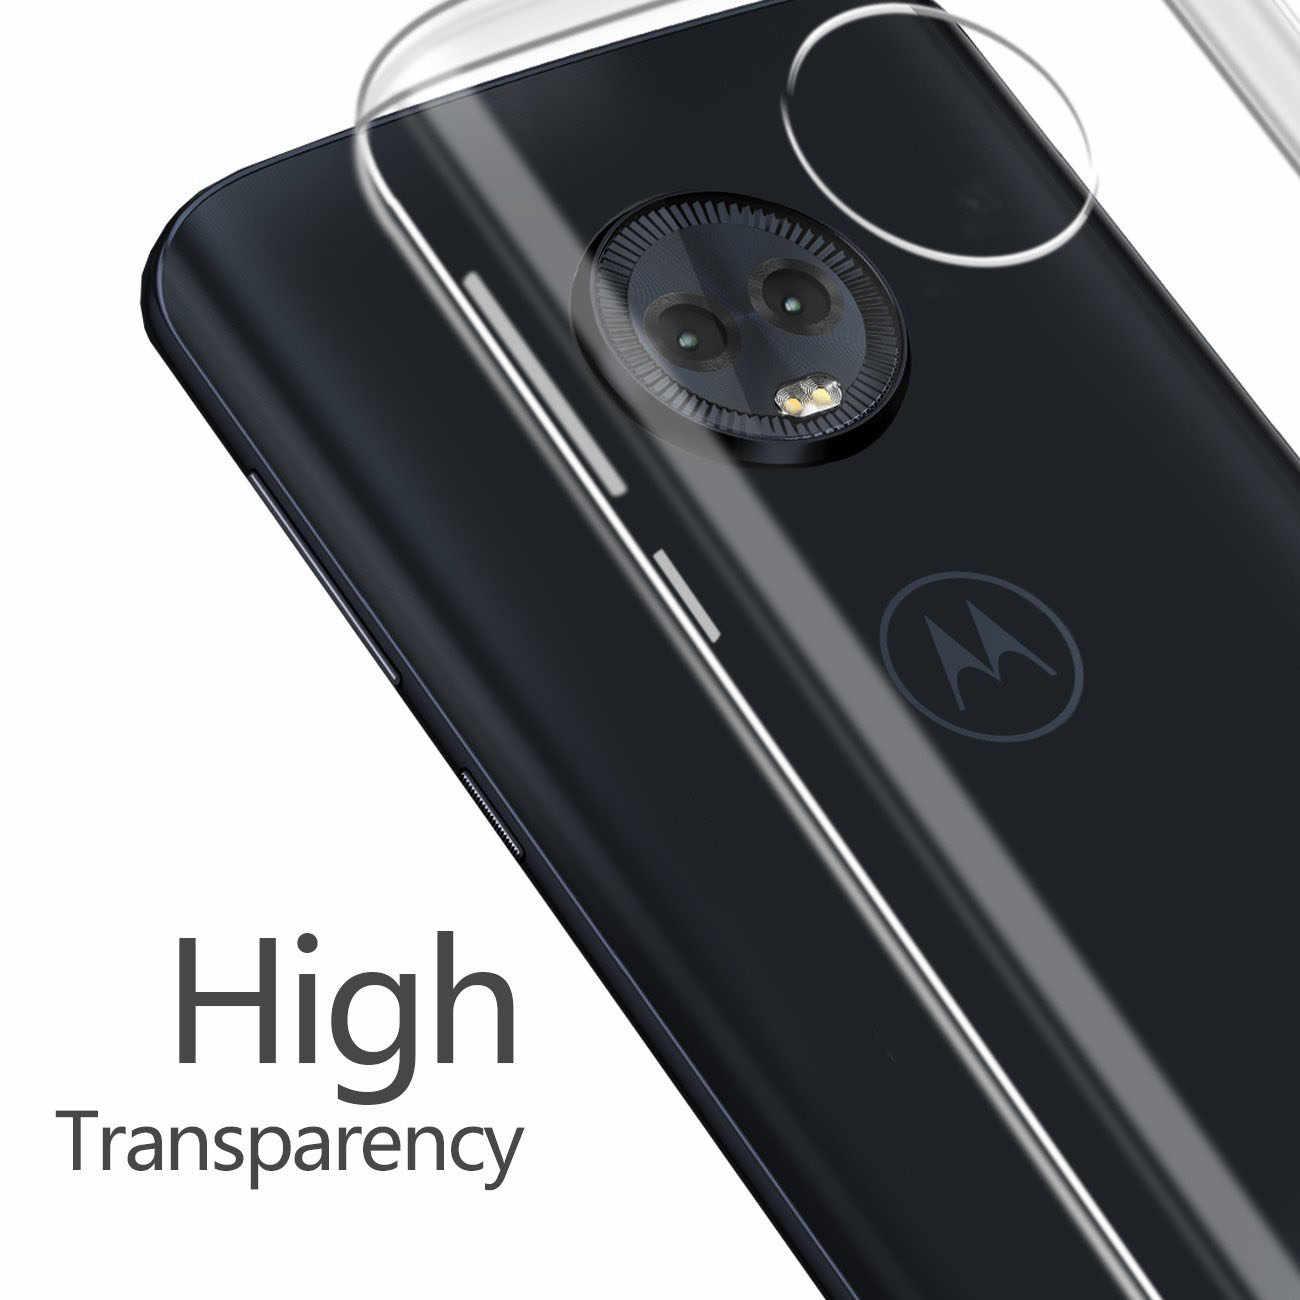 2018 CLEAR Soft TPU สำหรับ Motorola Moto G6 Plus กรณีเล่นโปร่งใสซิลิโคน MotoG6 G6Play G6Plus ถุงเจล